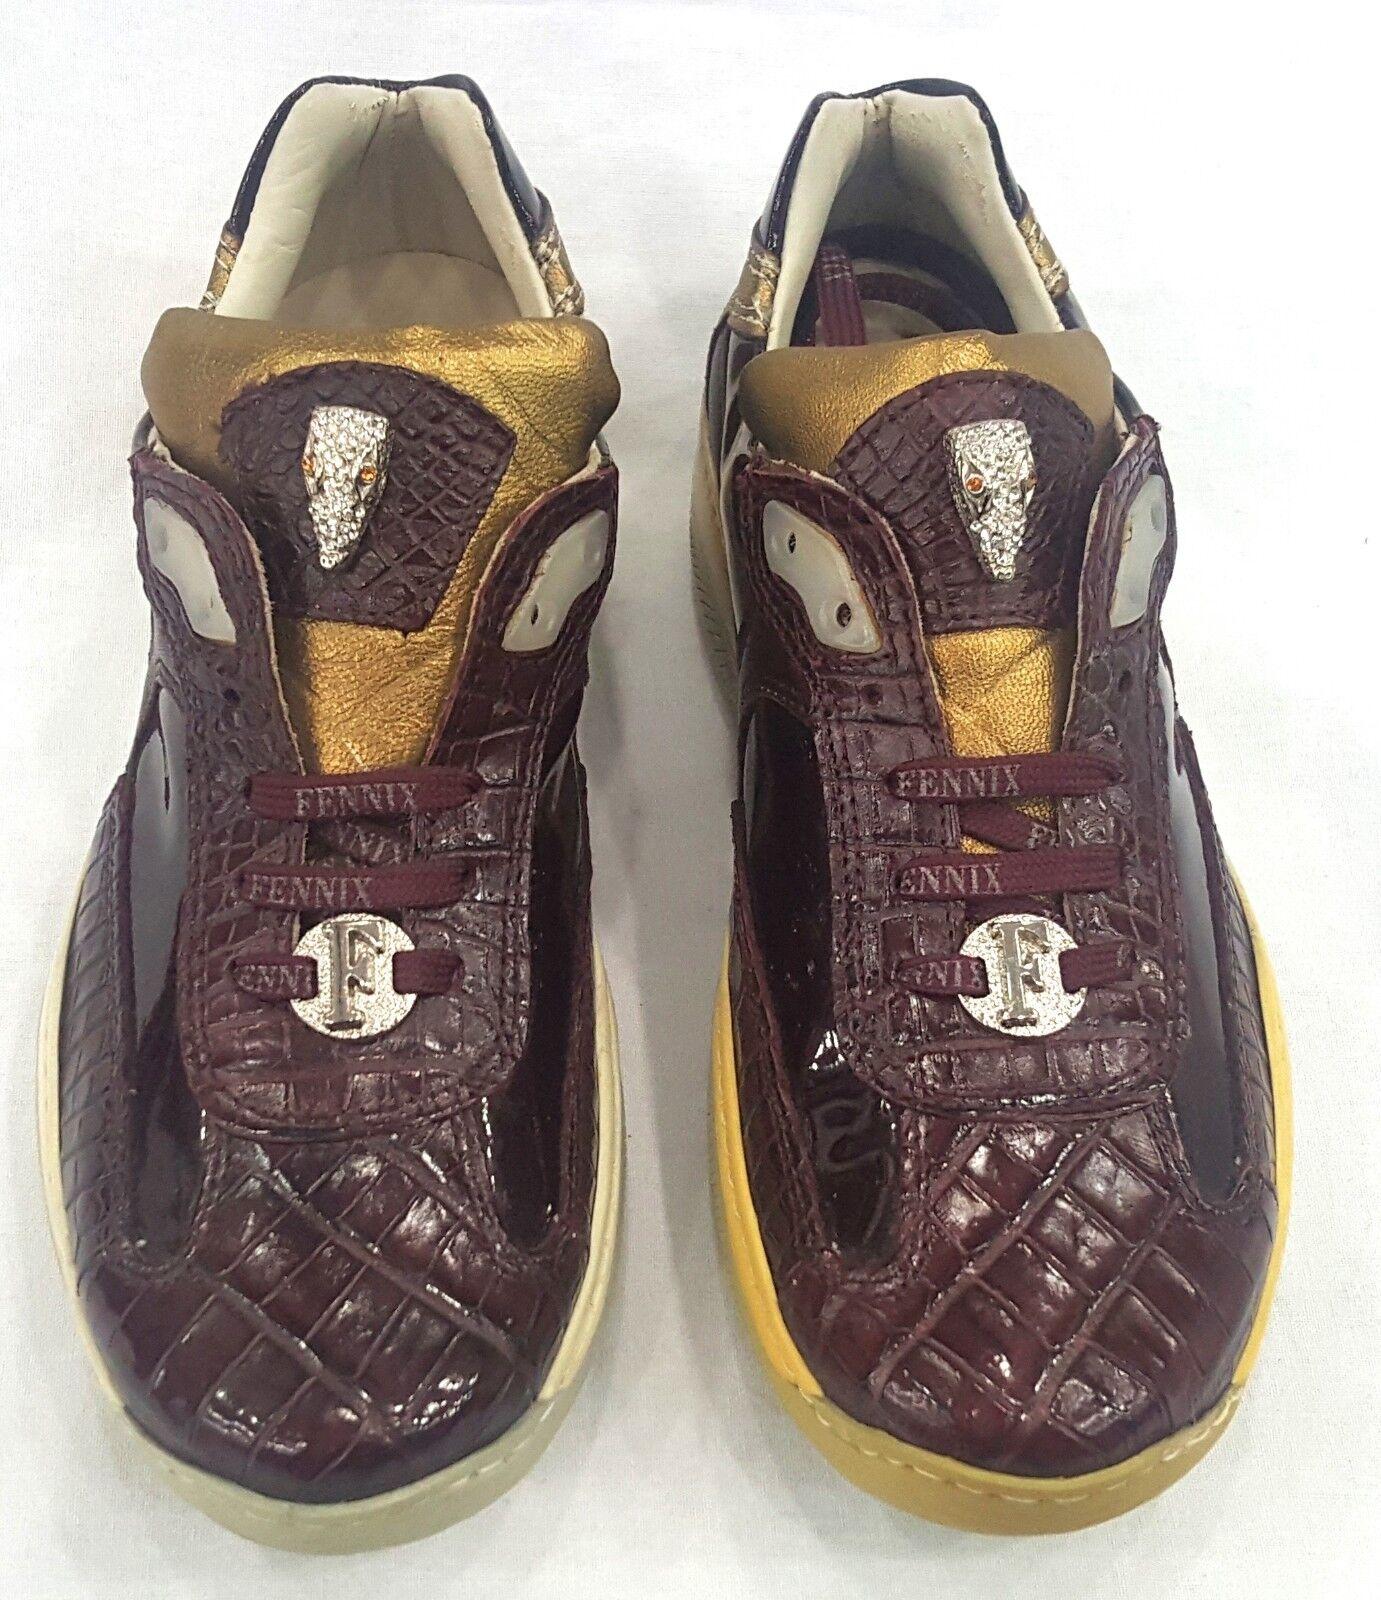 FENNIX ITALY WOMEN'S BURGANDY NAPPA PATENT CROC SNEAKER Schuhe BURGANDY WOMEN'S SIZE 5 5187cb